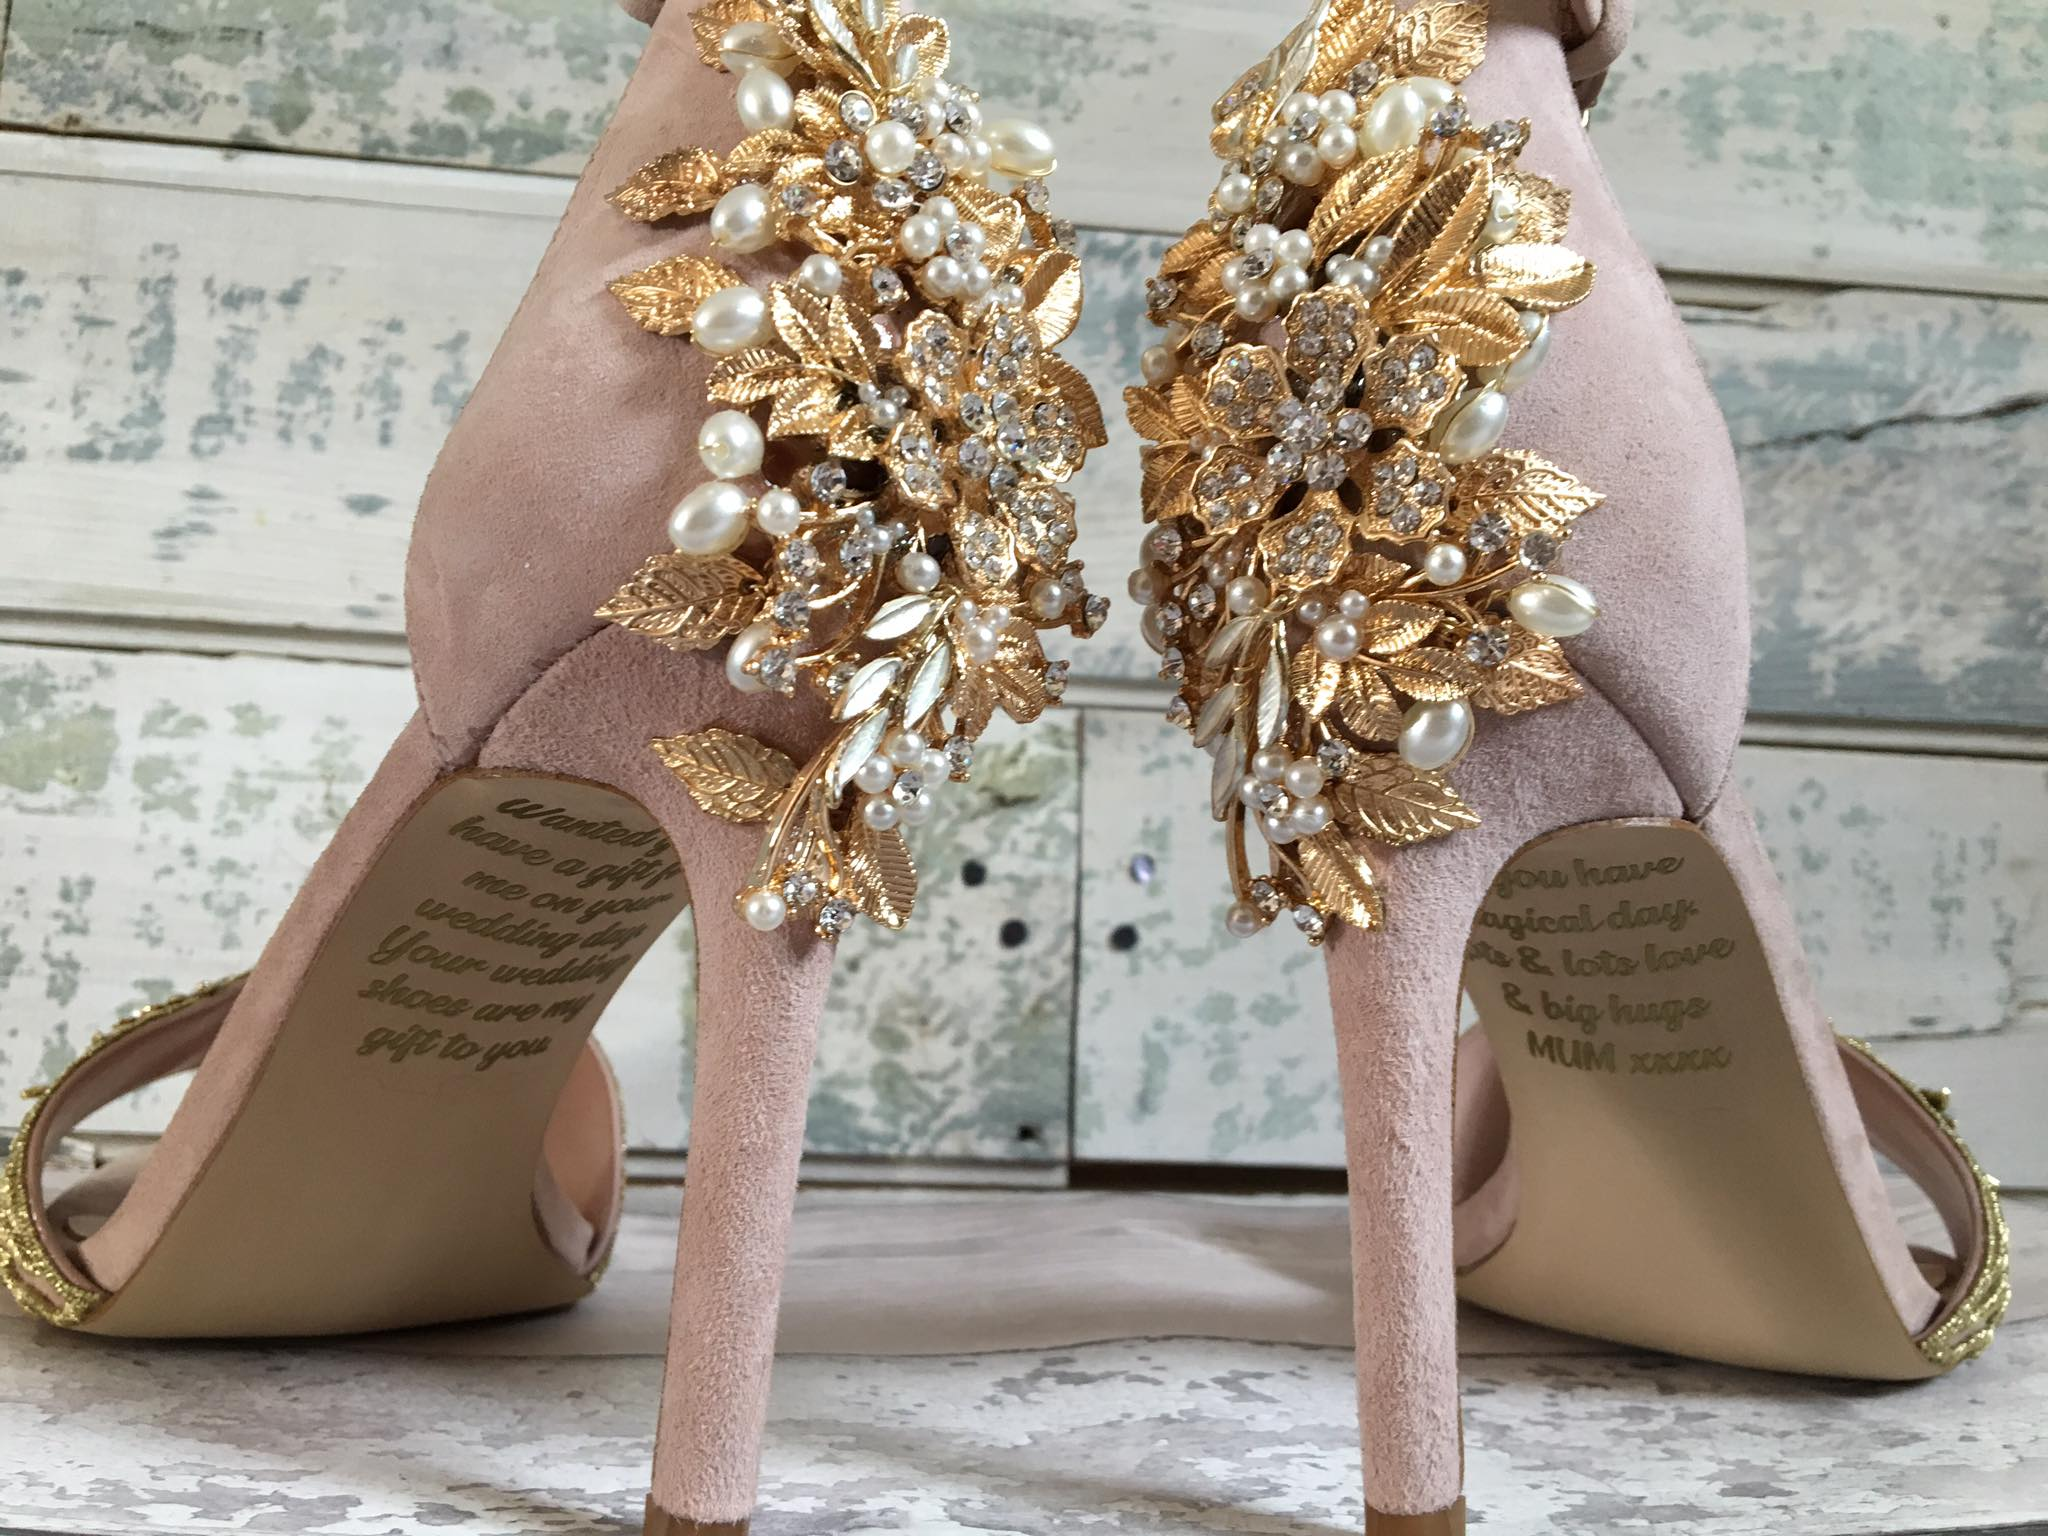 fba19540191 Το κρυφό μήνυμα στα νυφικά παπούτσια αυτής της γυναίκας θα σας κάνει ...